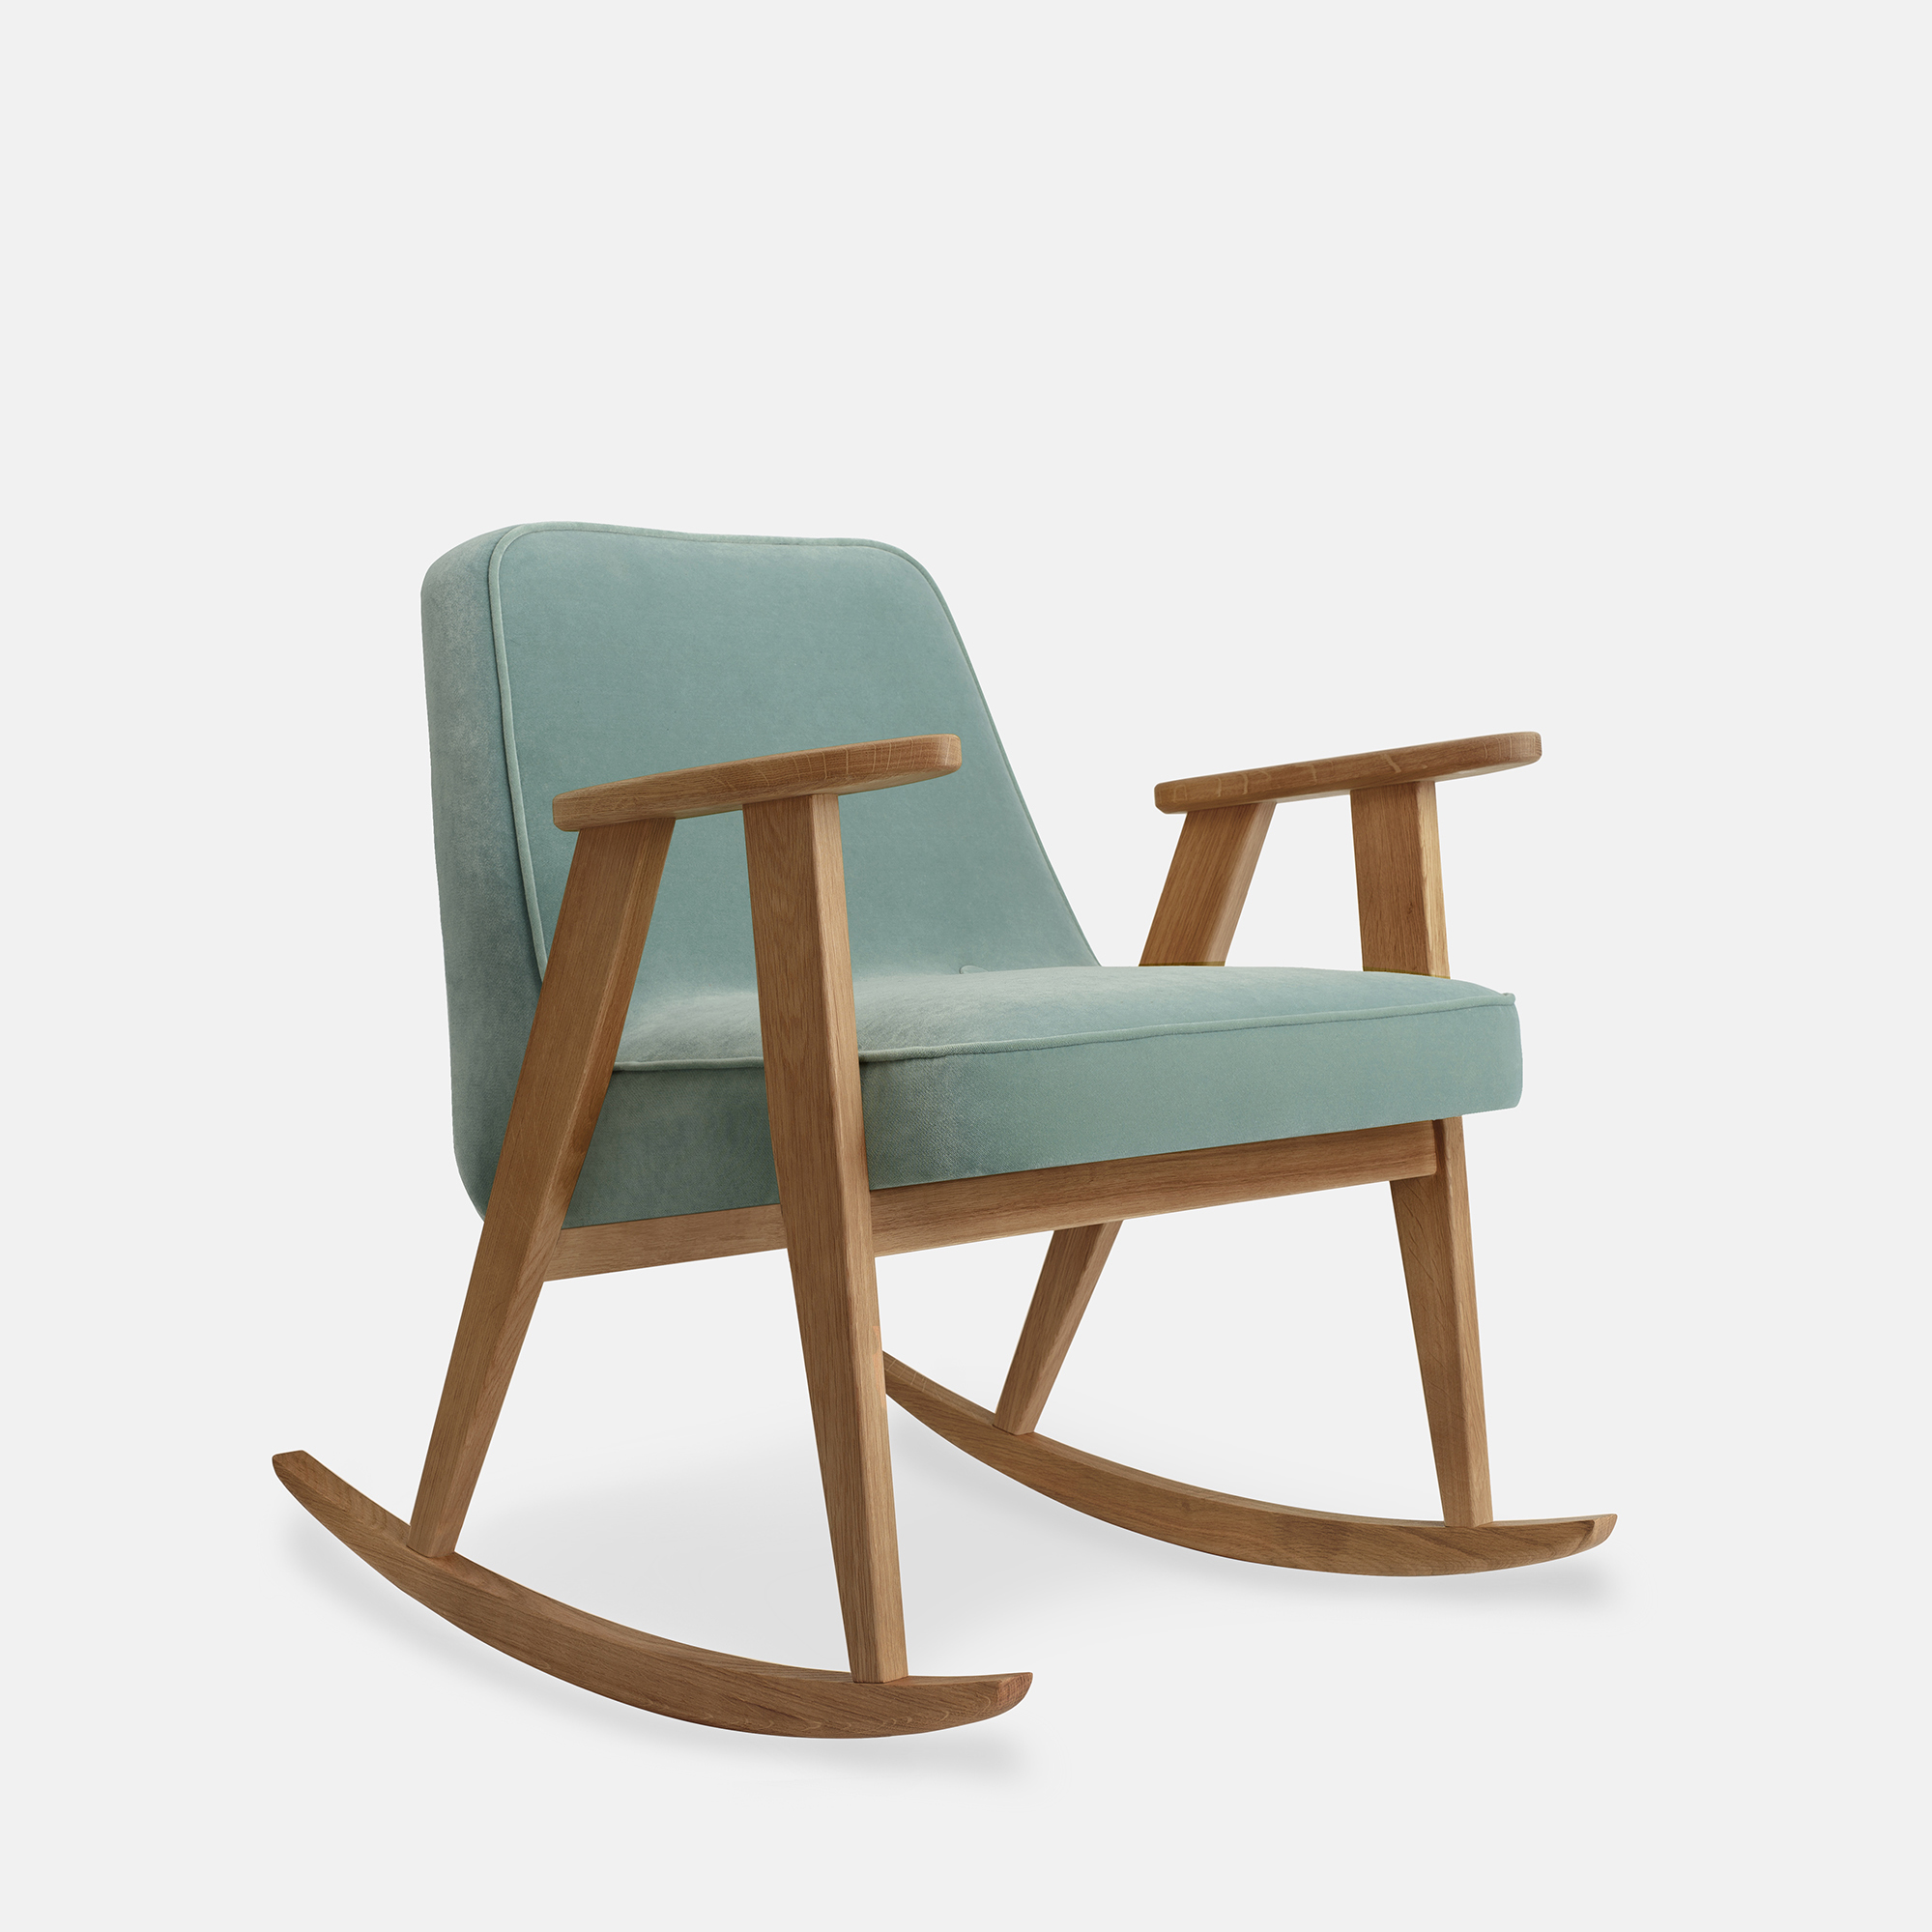 366-Concept-366-Rocking-Chair-W02-Velvet-Mint